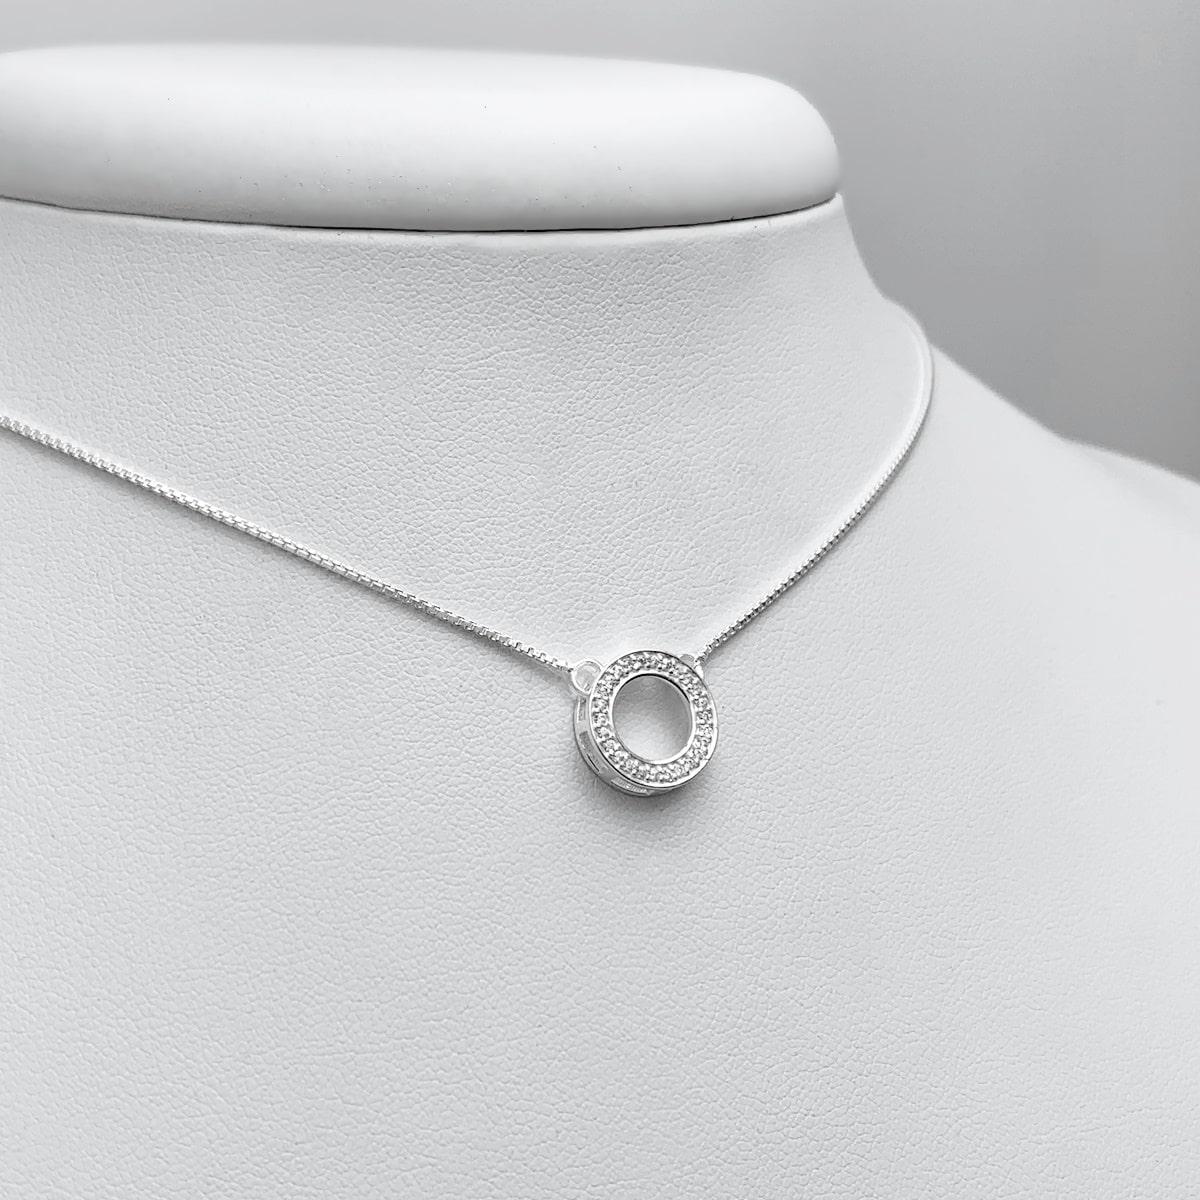 Colar Círculo Cravejado Prata 925, Colar de Prata